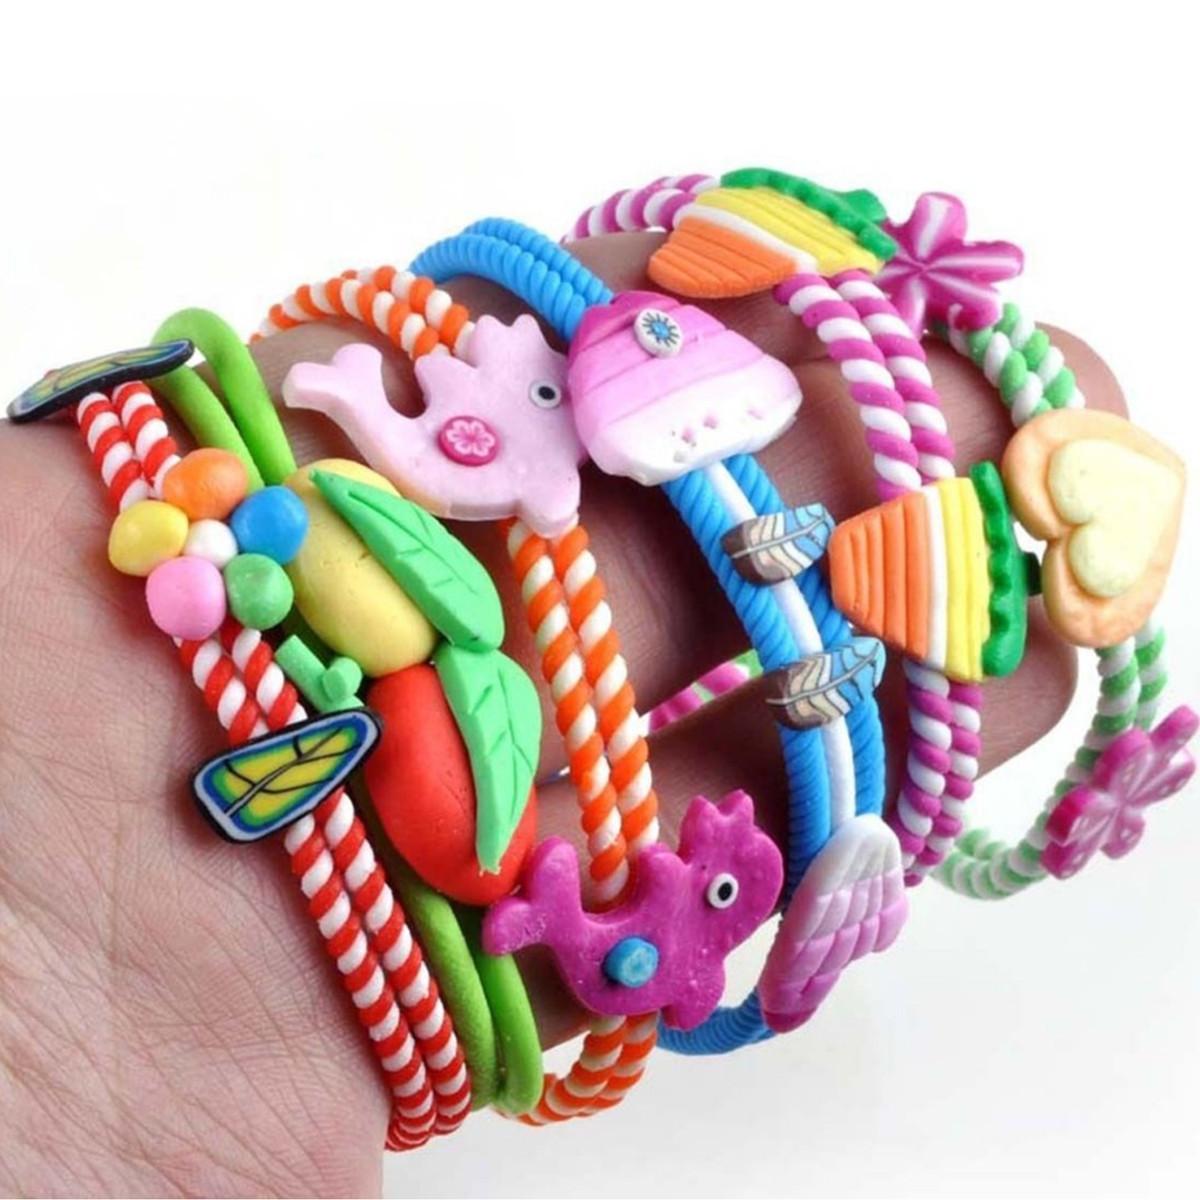 Sweet-Baby-Bangle-Jewelry-Polymer-Clay-Kids-Children-Bracelets-Wrist-band thumbnail 5